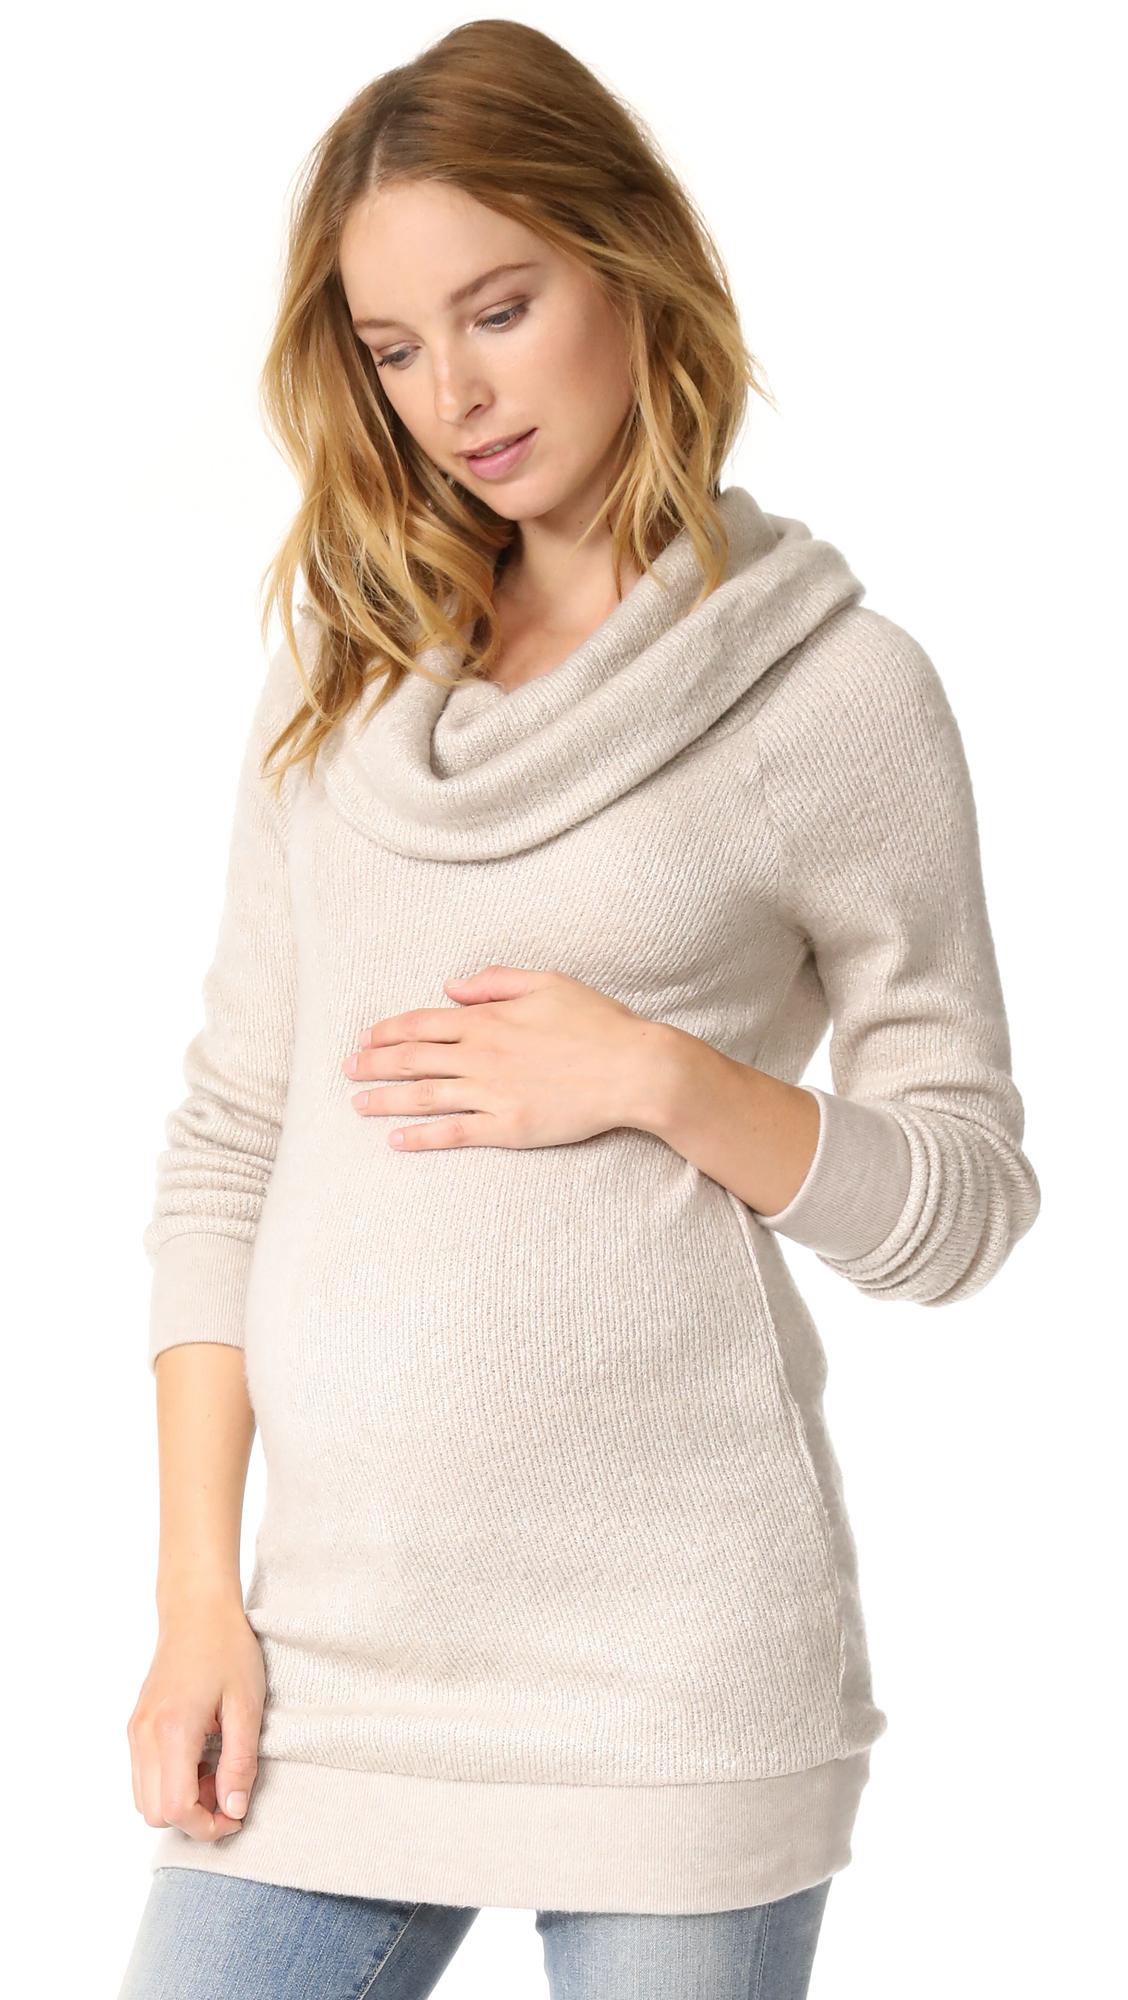 684d3012b439 Ingrid & Isabel Cowl Neck Maternity Sweater | SHOPBOP